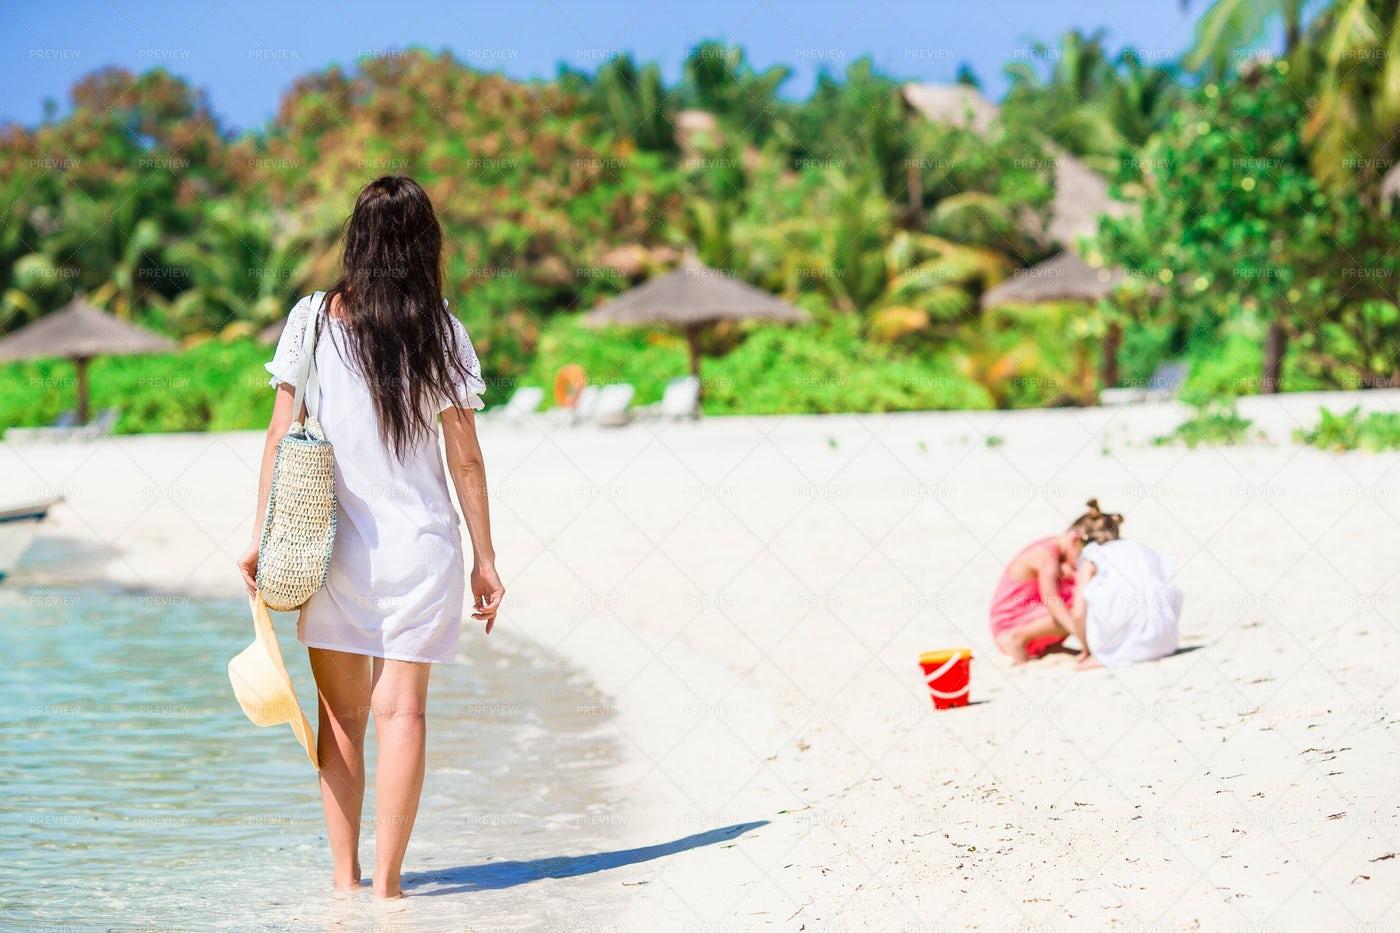 Walking On The Seashore: Stock Photos